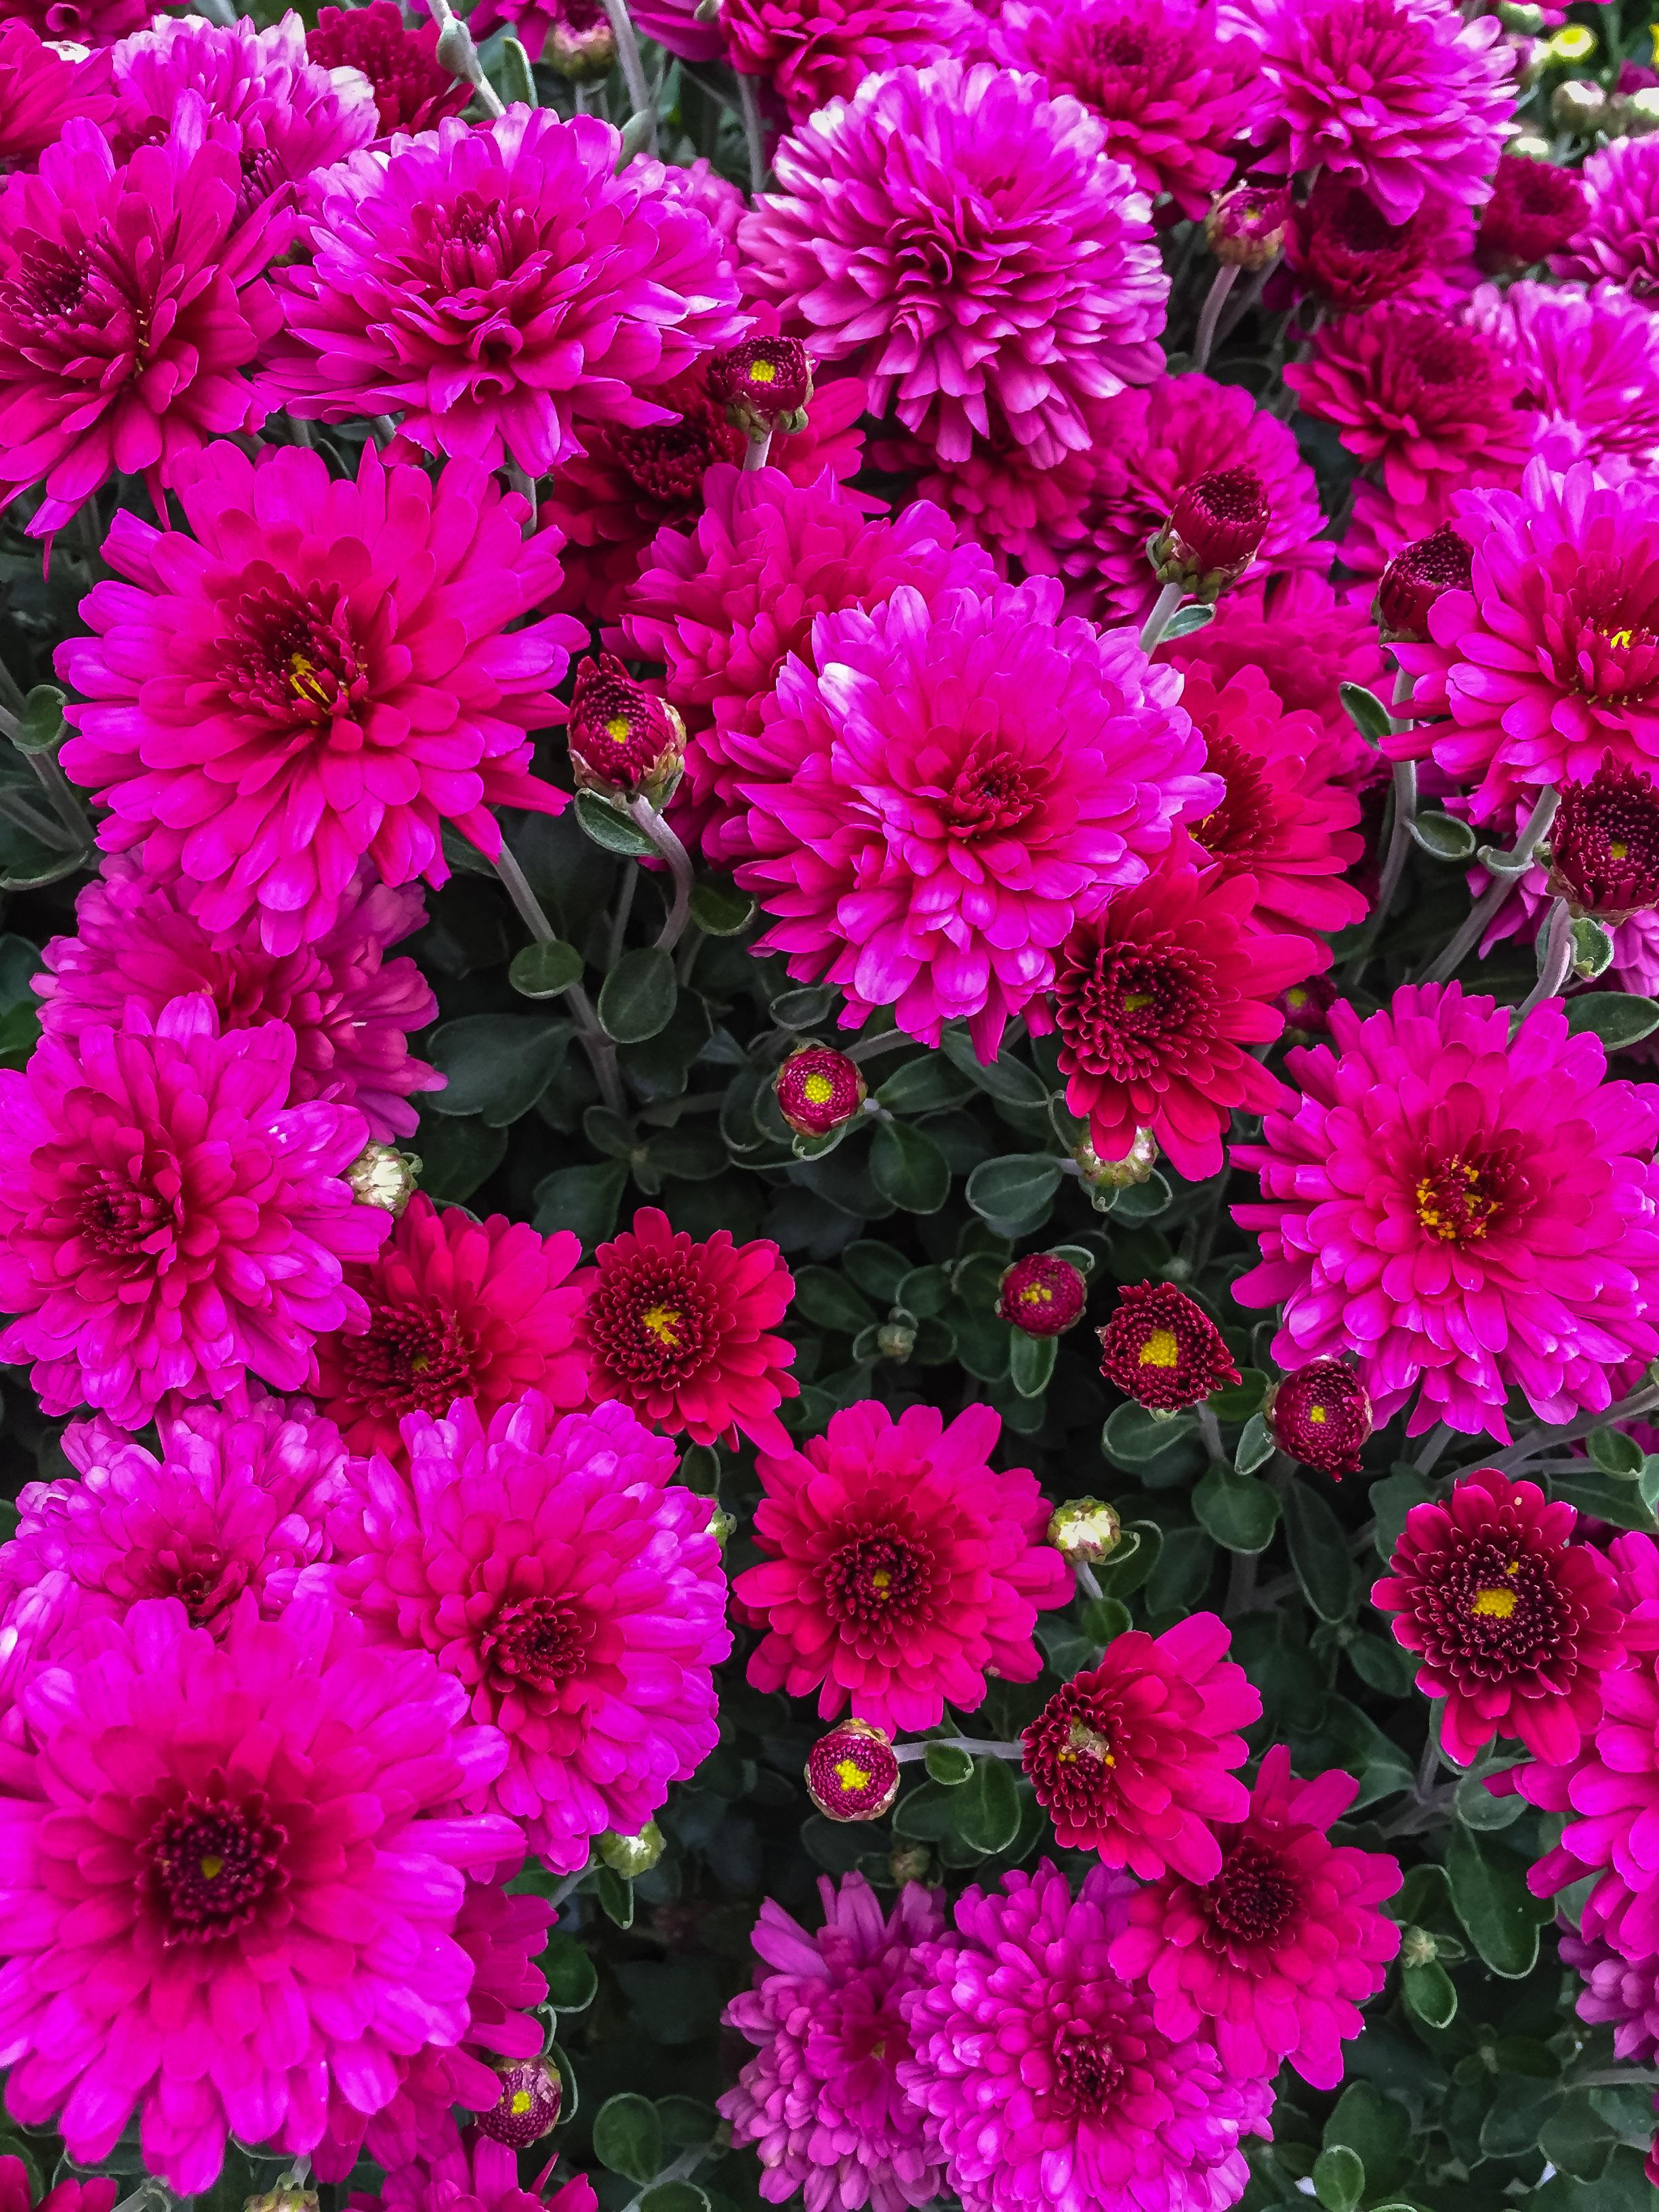 Fall flowers sweet life kitchens fall flower 0118 mightylinksfo